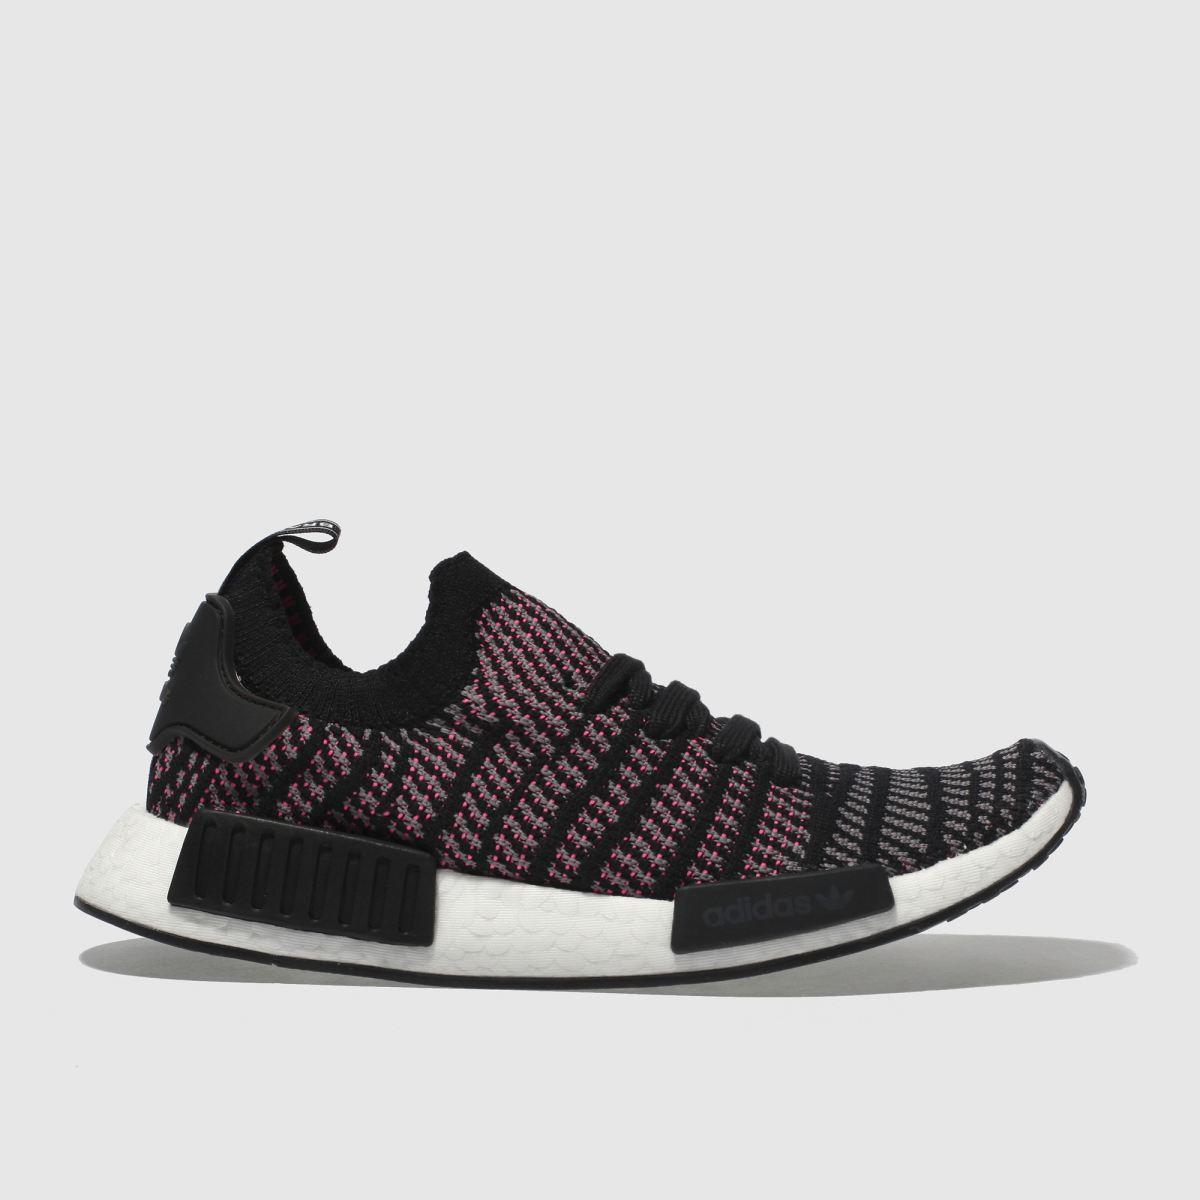 Adidas Grey & Black Nmd_r1 Stlt Primeknit Trainers